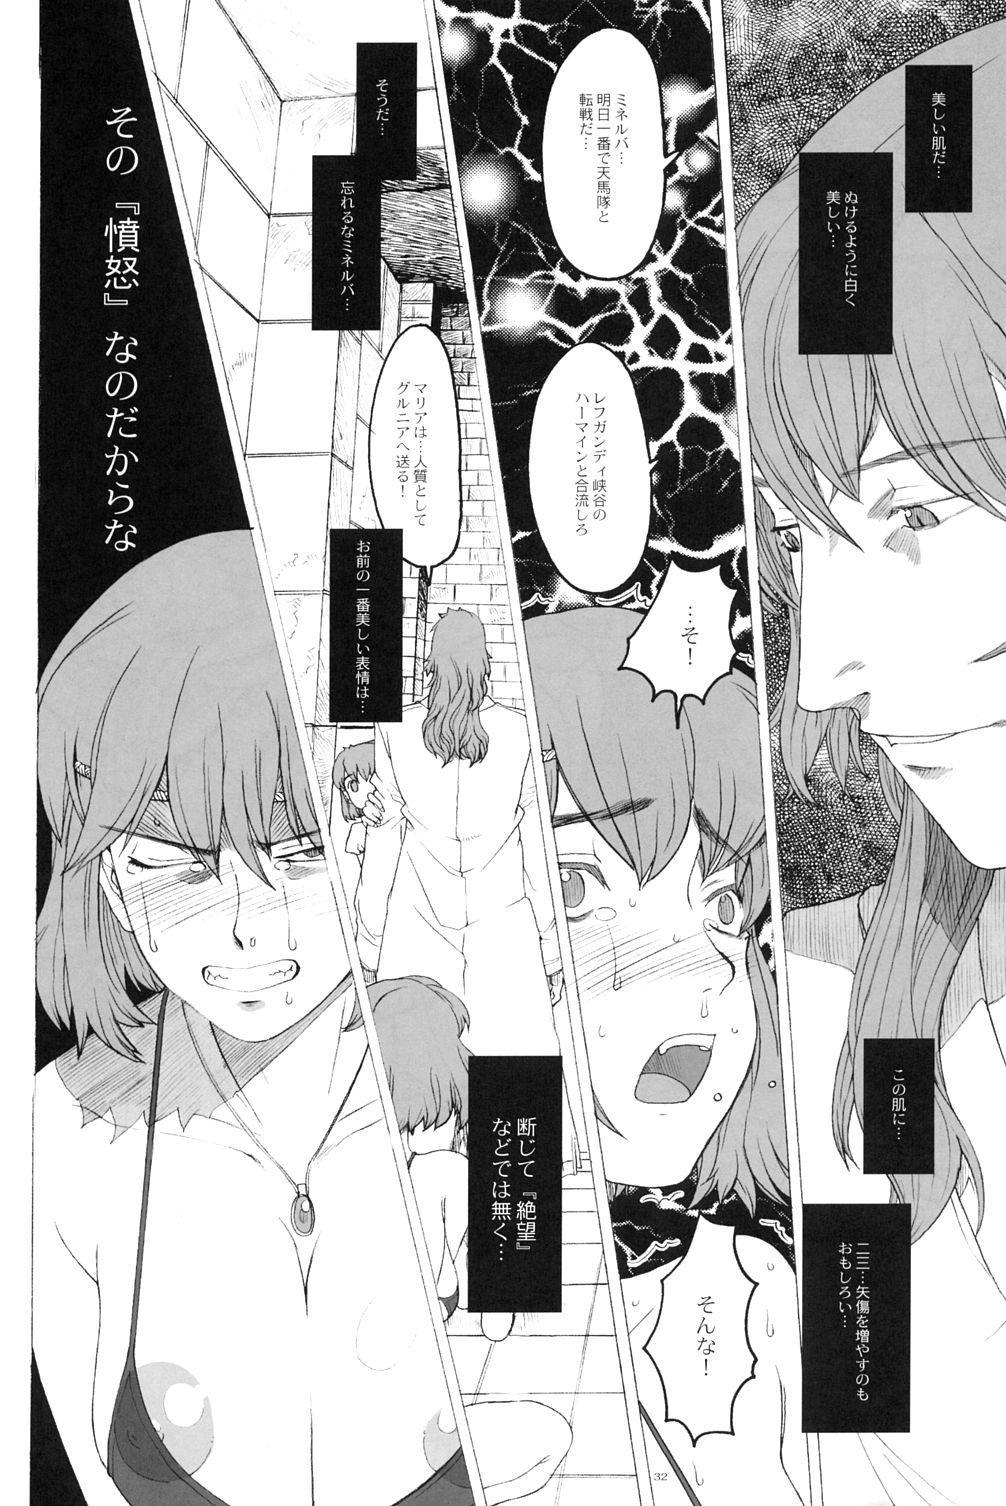 Kikan GIRLIE Vol.2 30